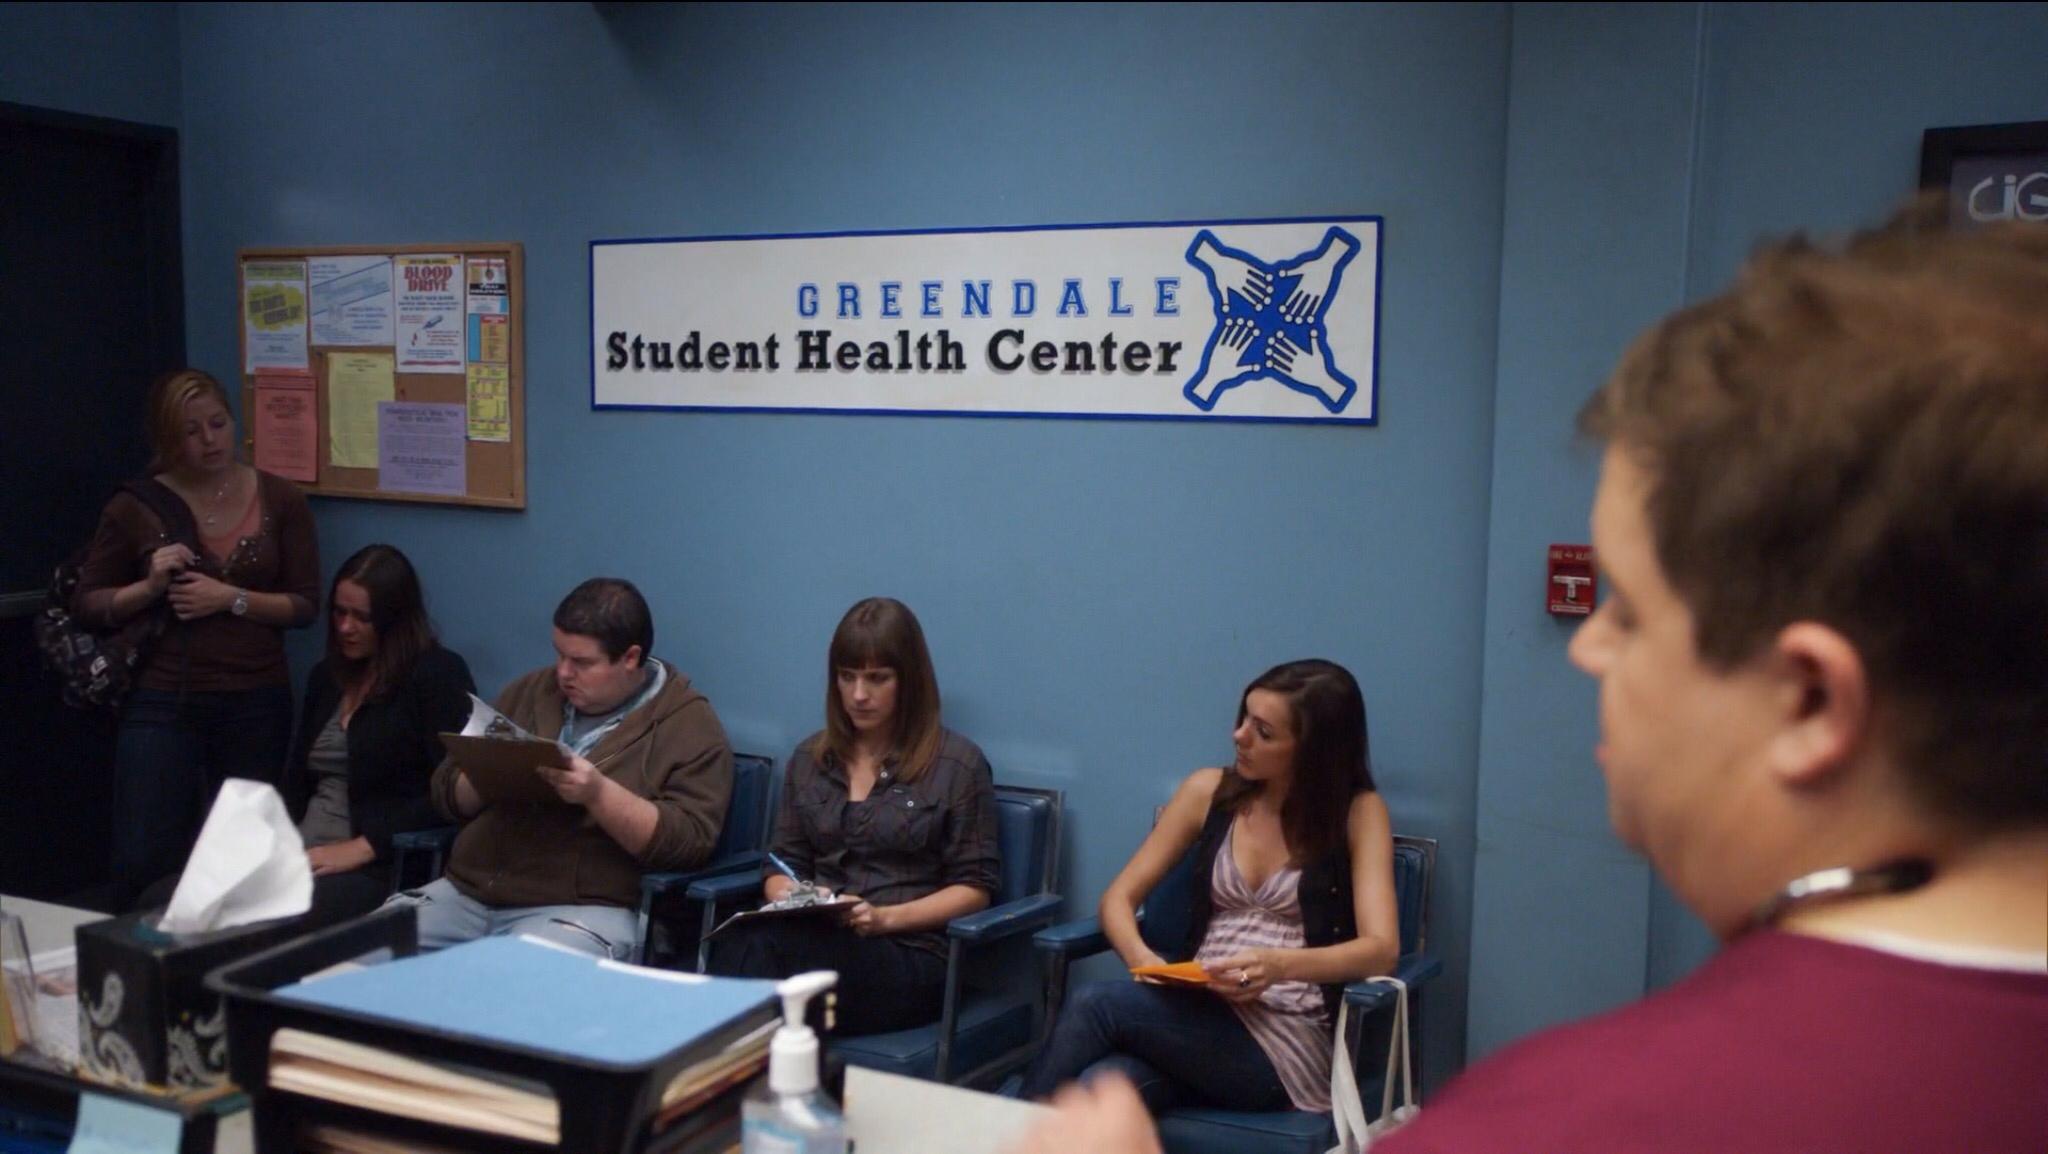 Greendale Student Health Center